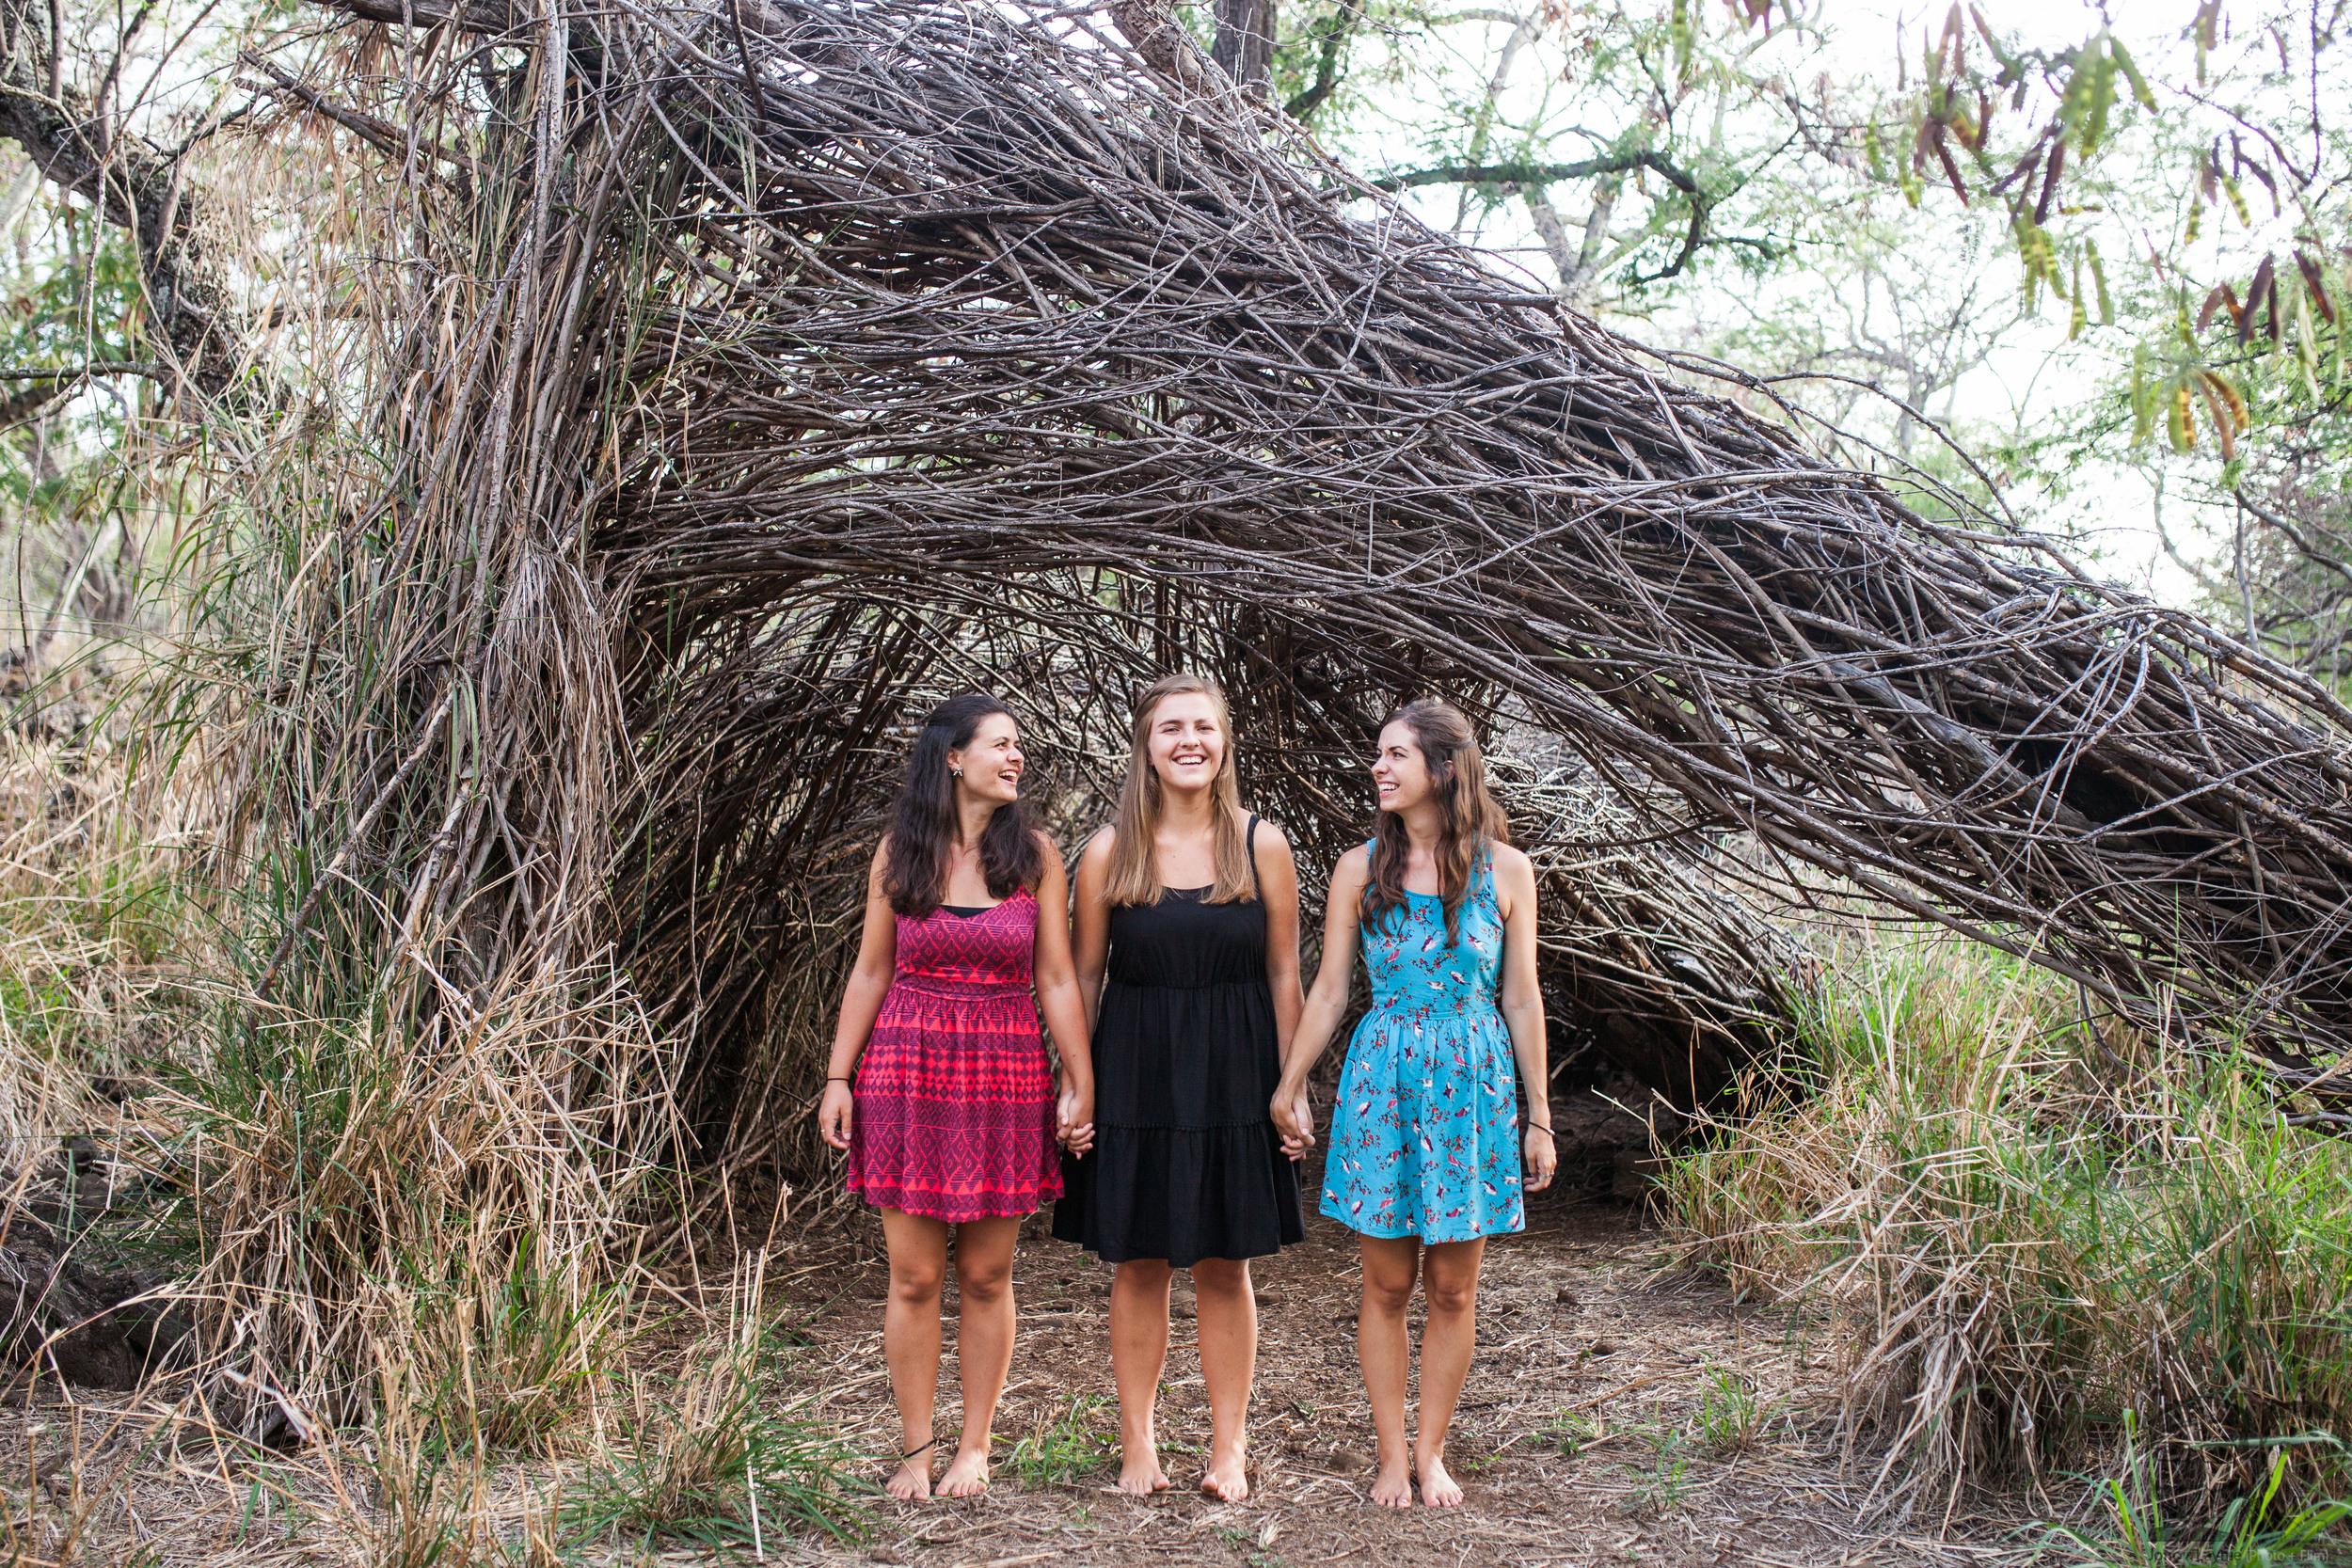 003Big Island Hawaii Photographers-Jono & Laynie Co.jpg